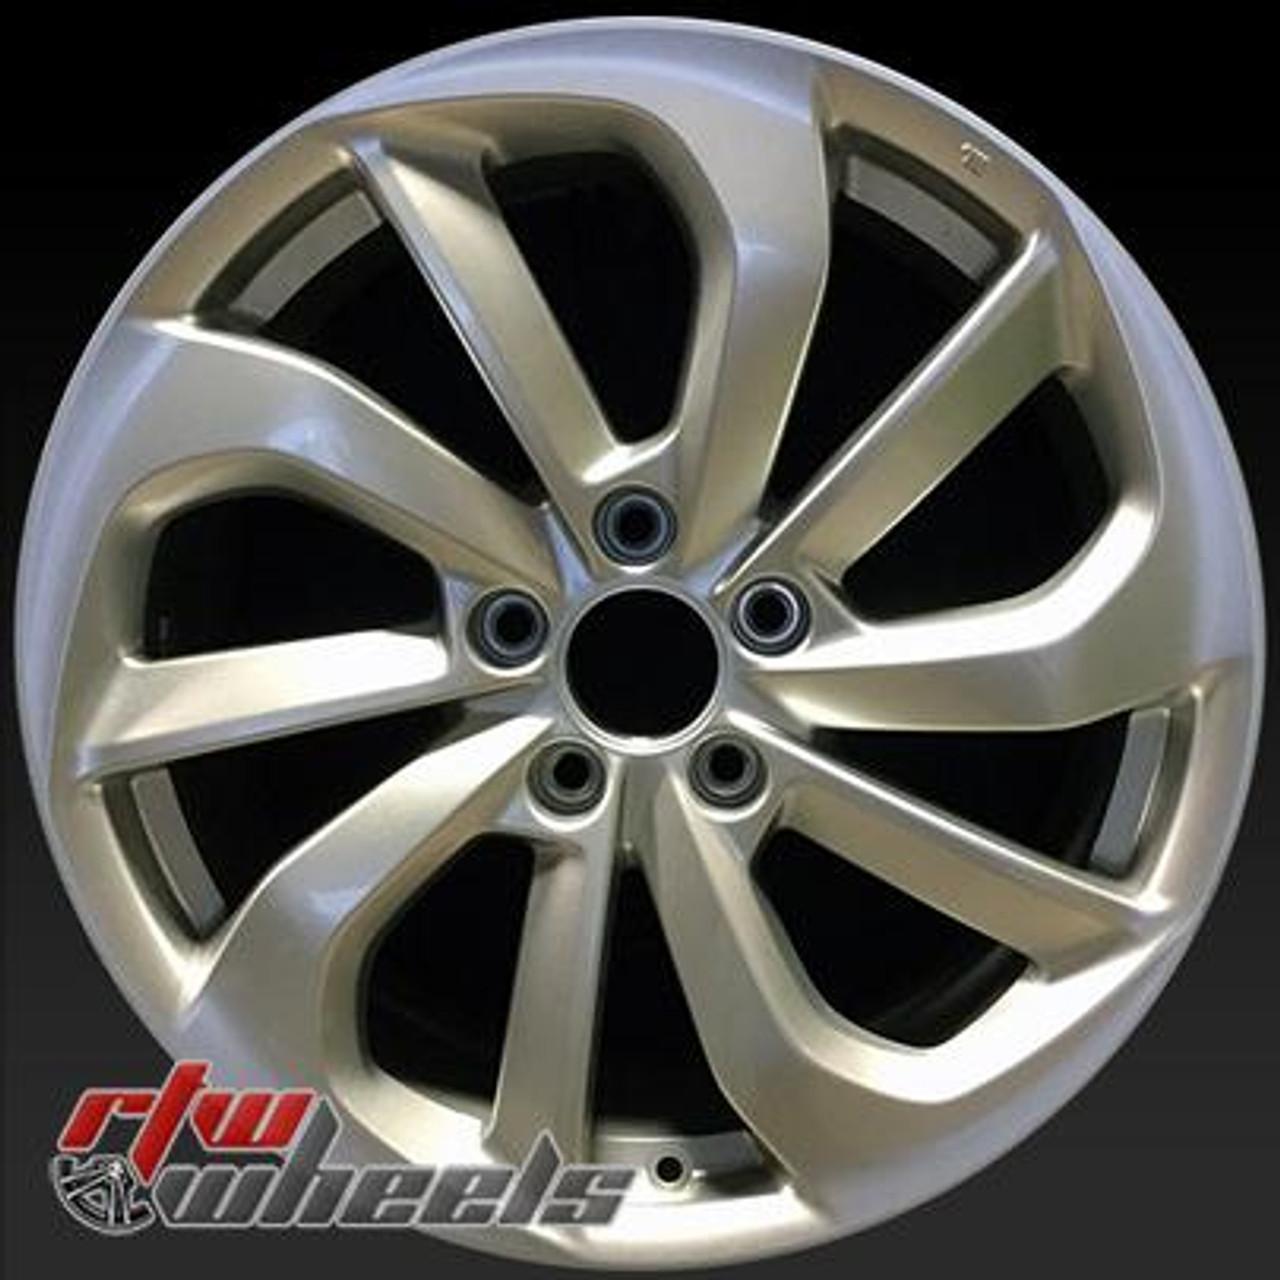 Acura RDX Wheels For Sale Silver Rims - Acura oem wheels